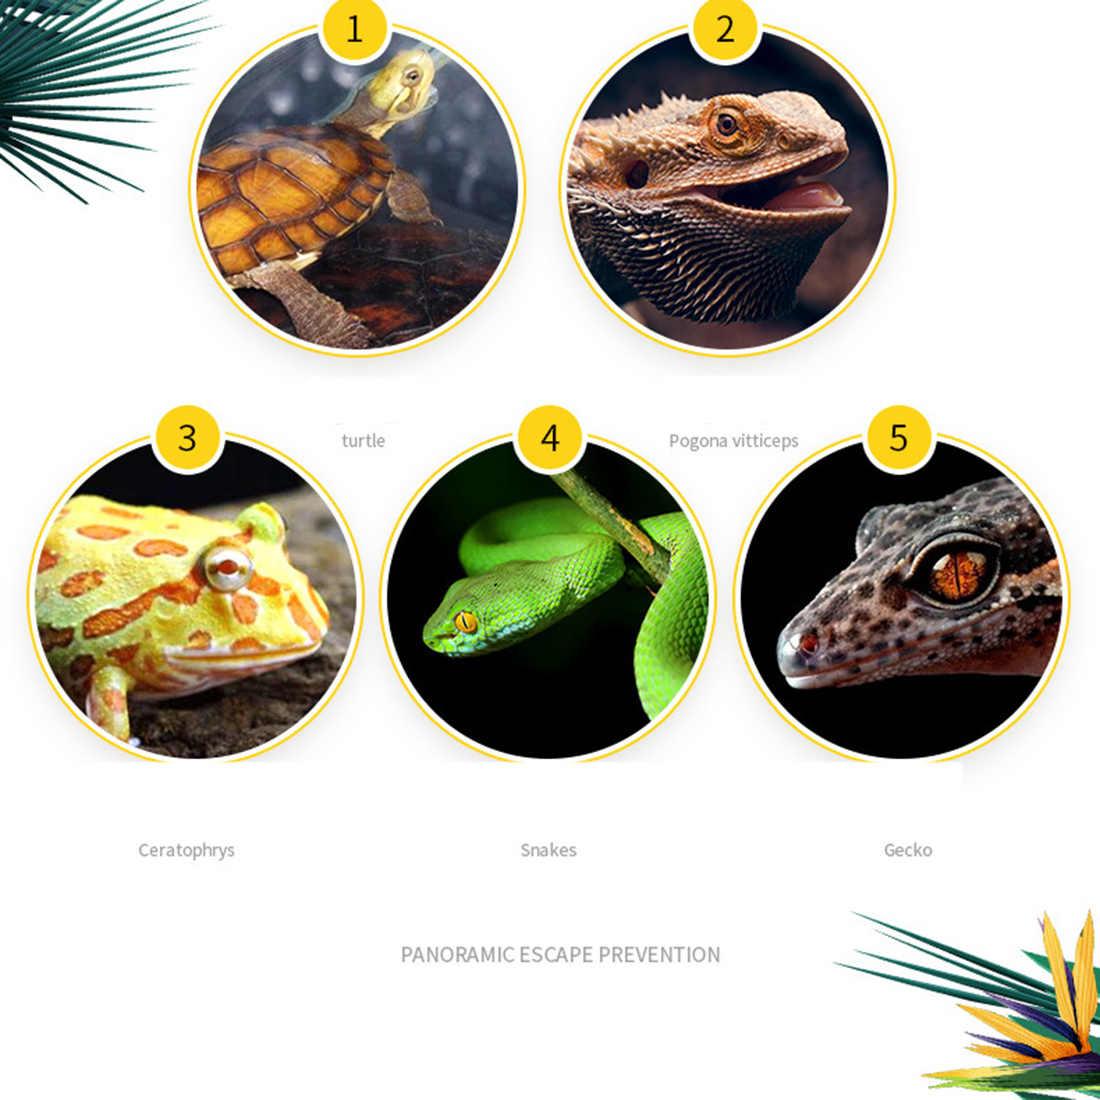 20X20X16 Reptil Terarium Mendaki Hewan Peliharaan Makan Kotak Stackable Beetle Laba-laba Peternakan Wadah dengan Horned Lizard Lumpur makan Pot